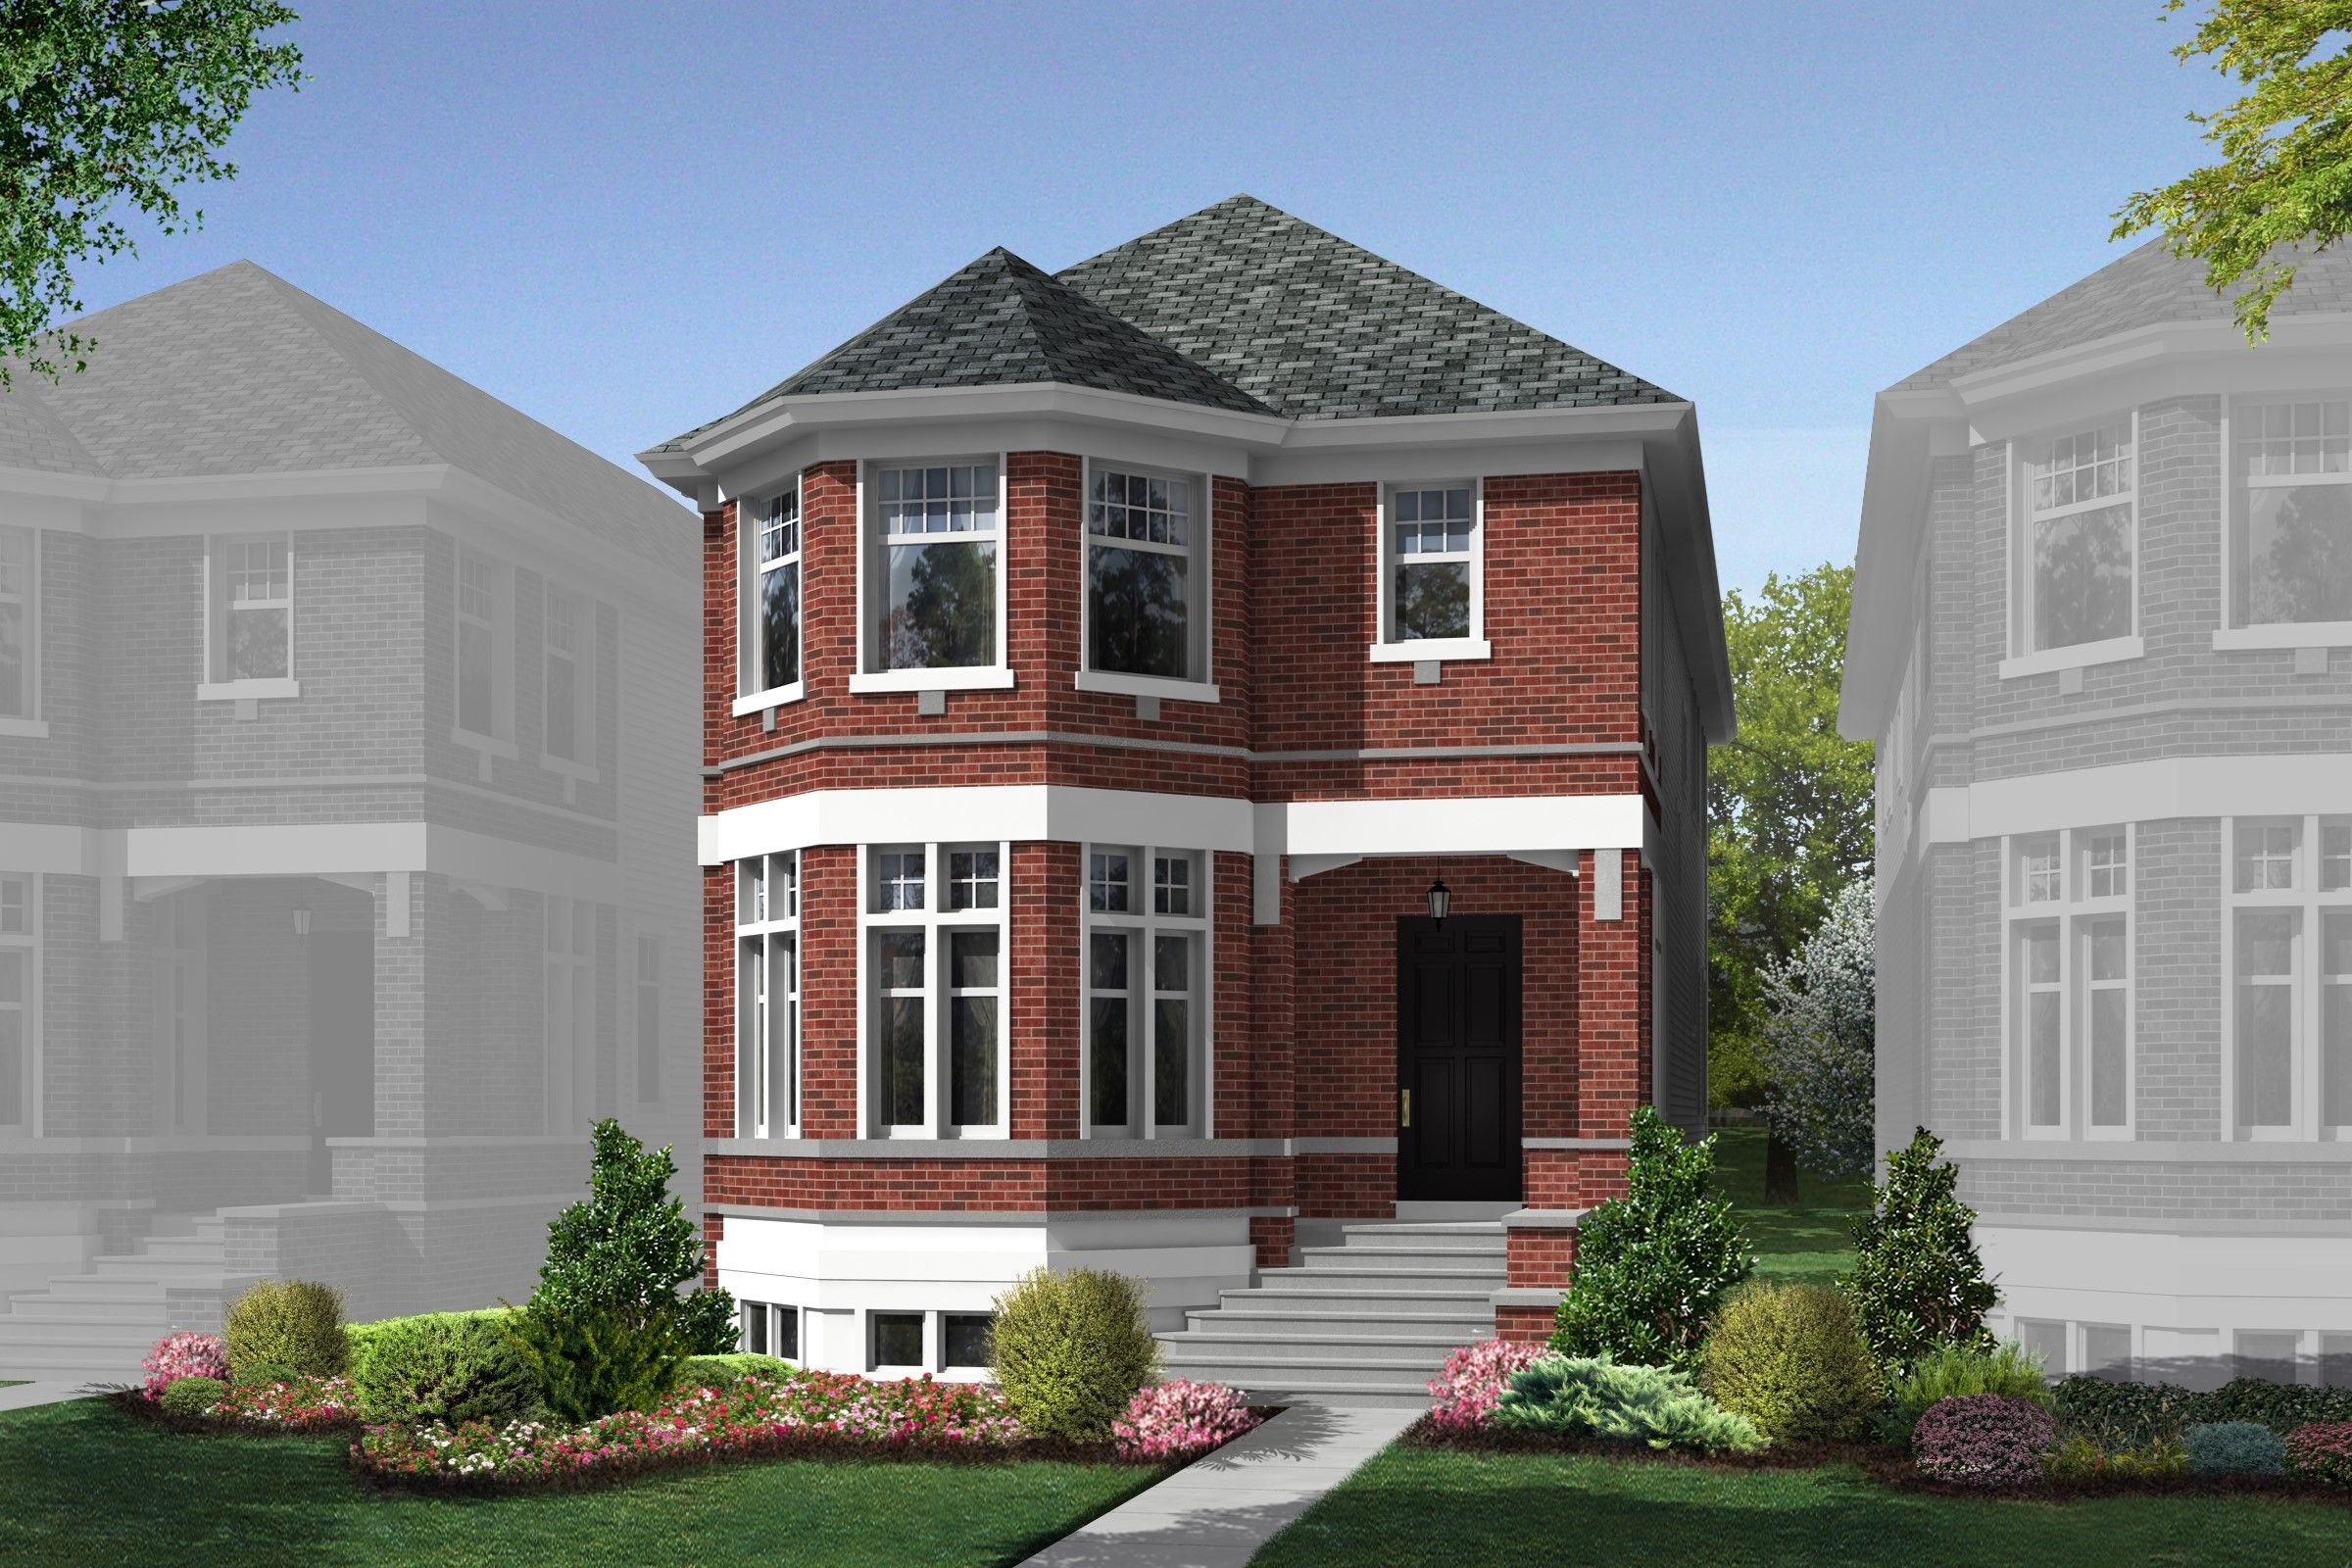 Single Family for Sale at Longfellow 6094 N. Sauganash Avenue, Homesite 31 Chicago, Illinois 60646 United States